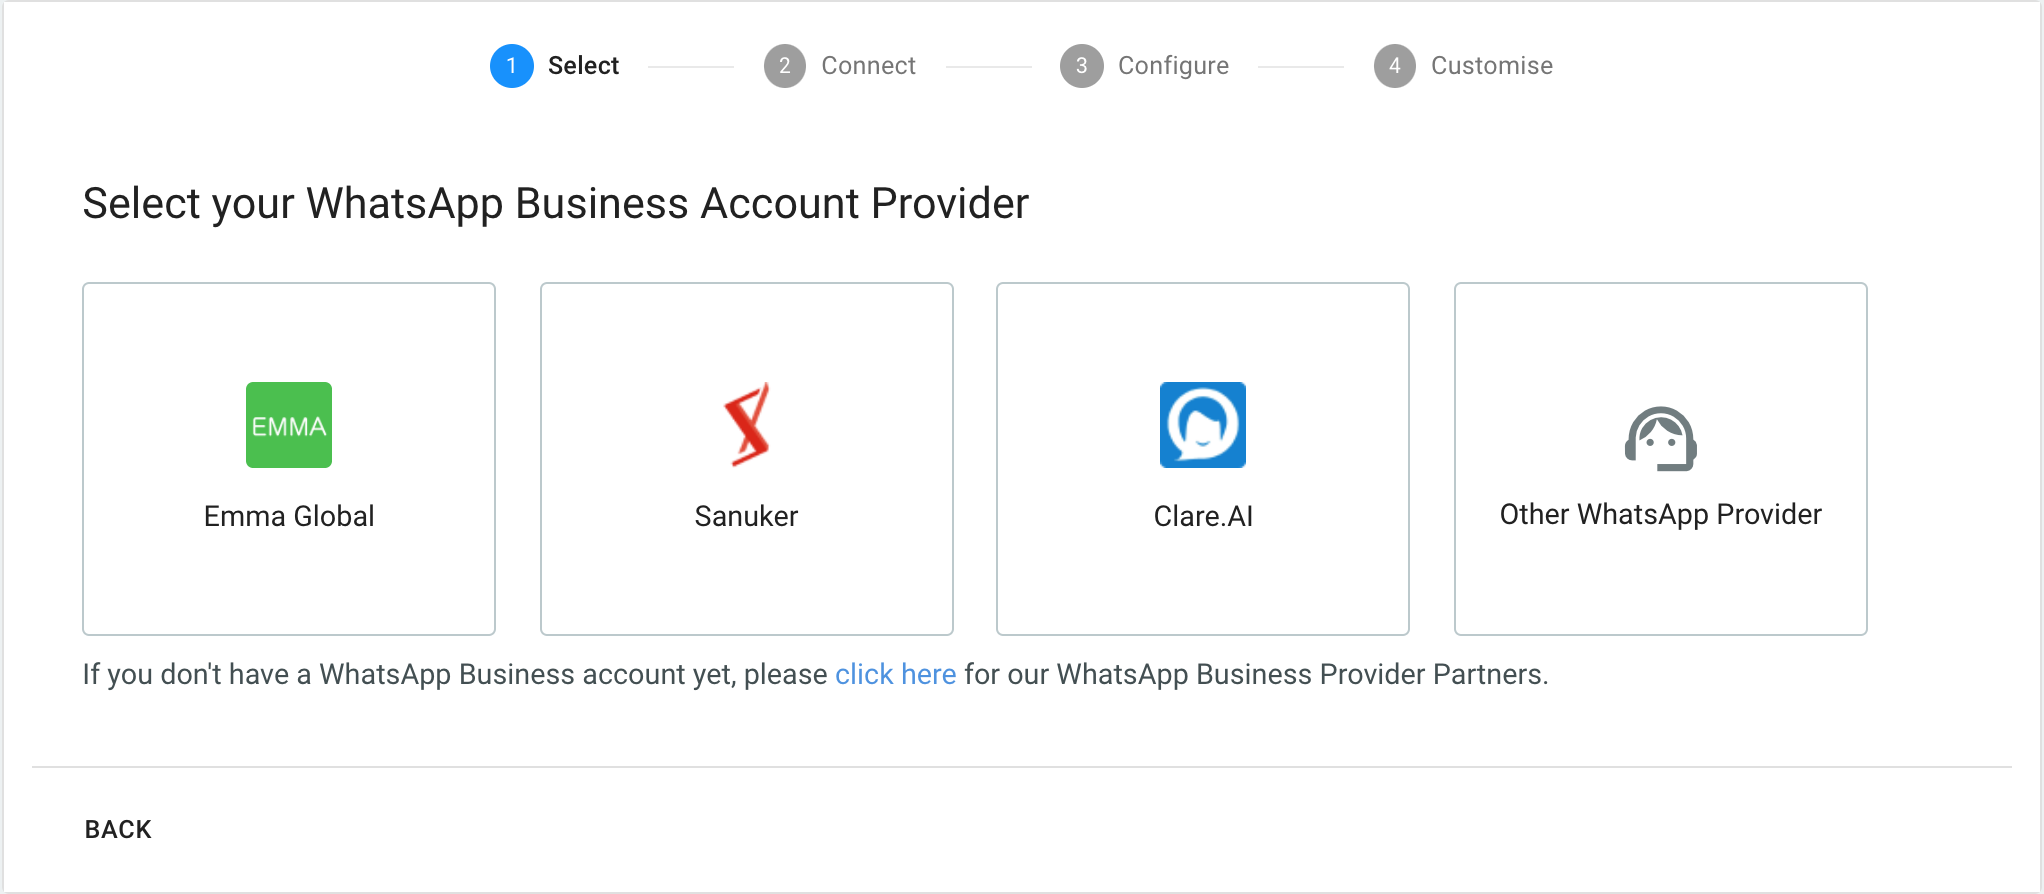 Selecting WhatsApp Provider